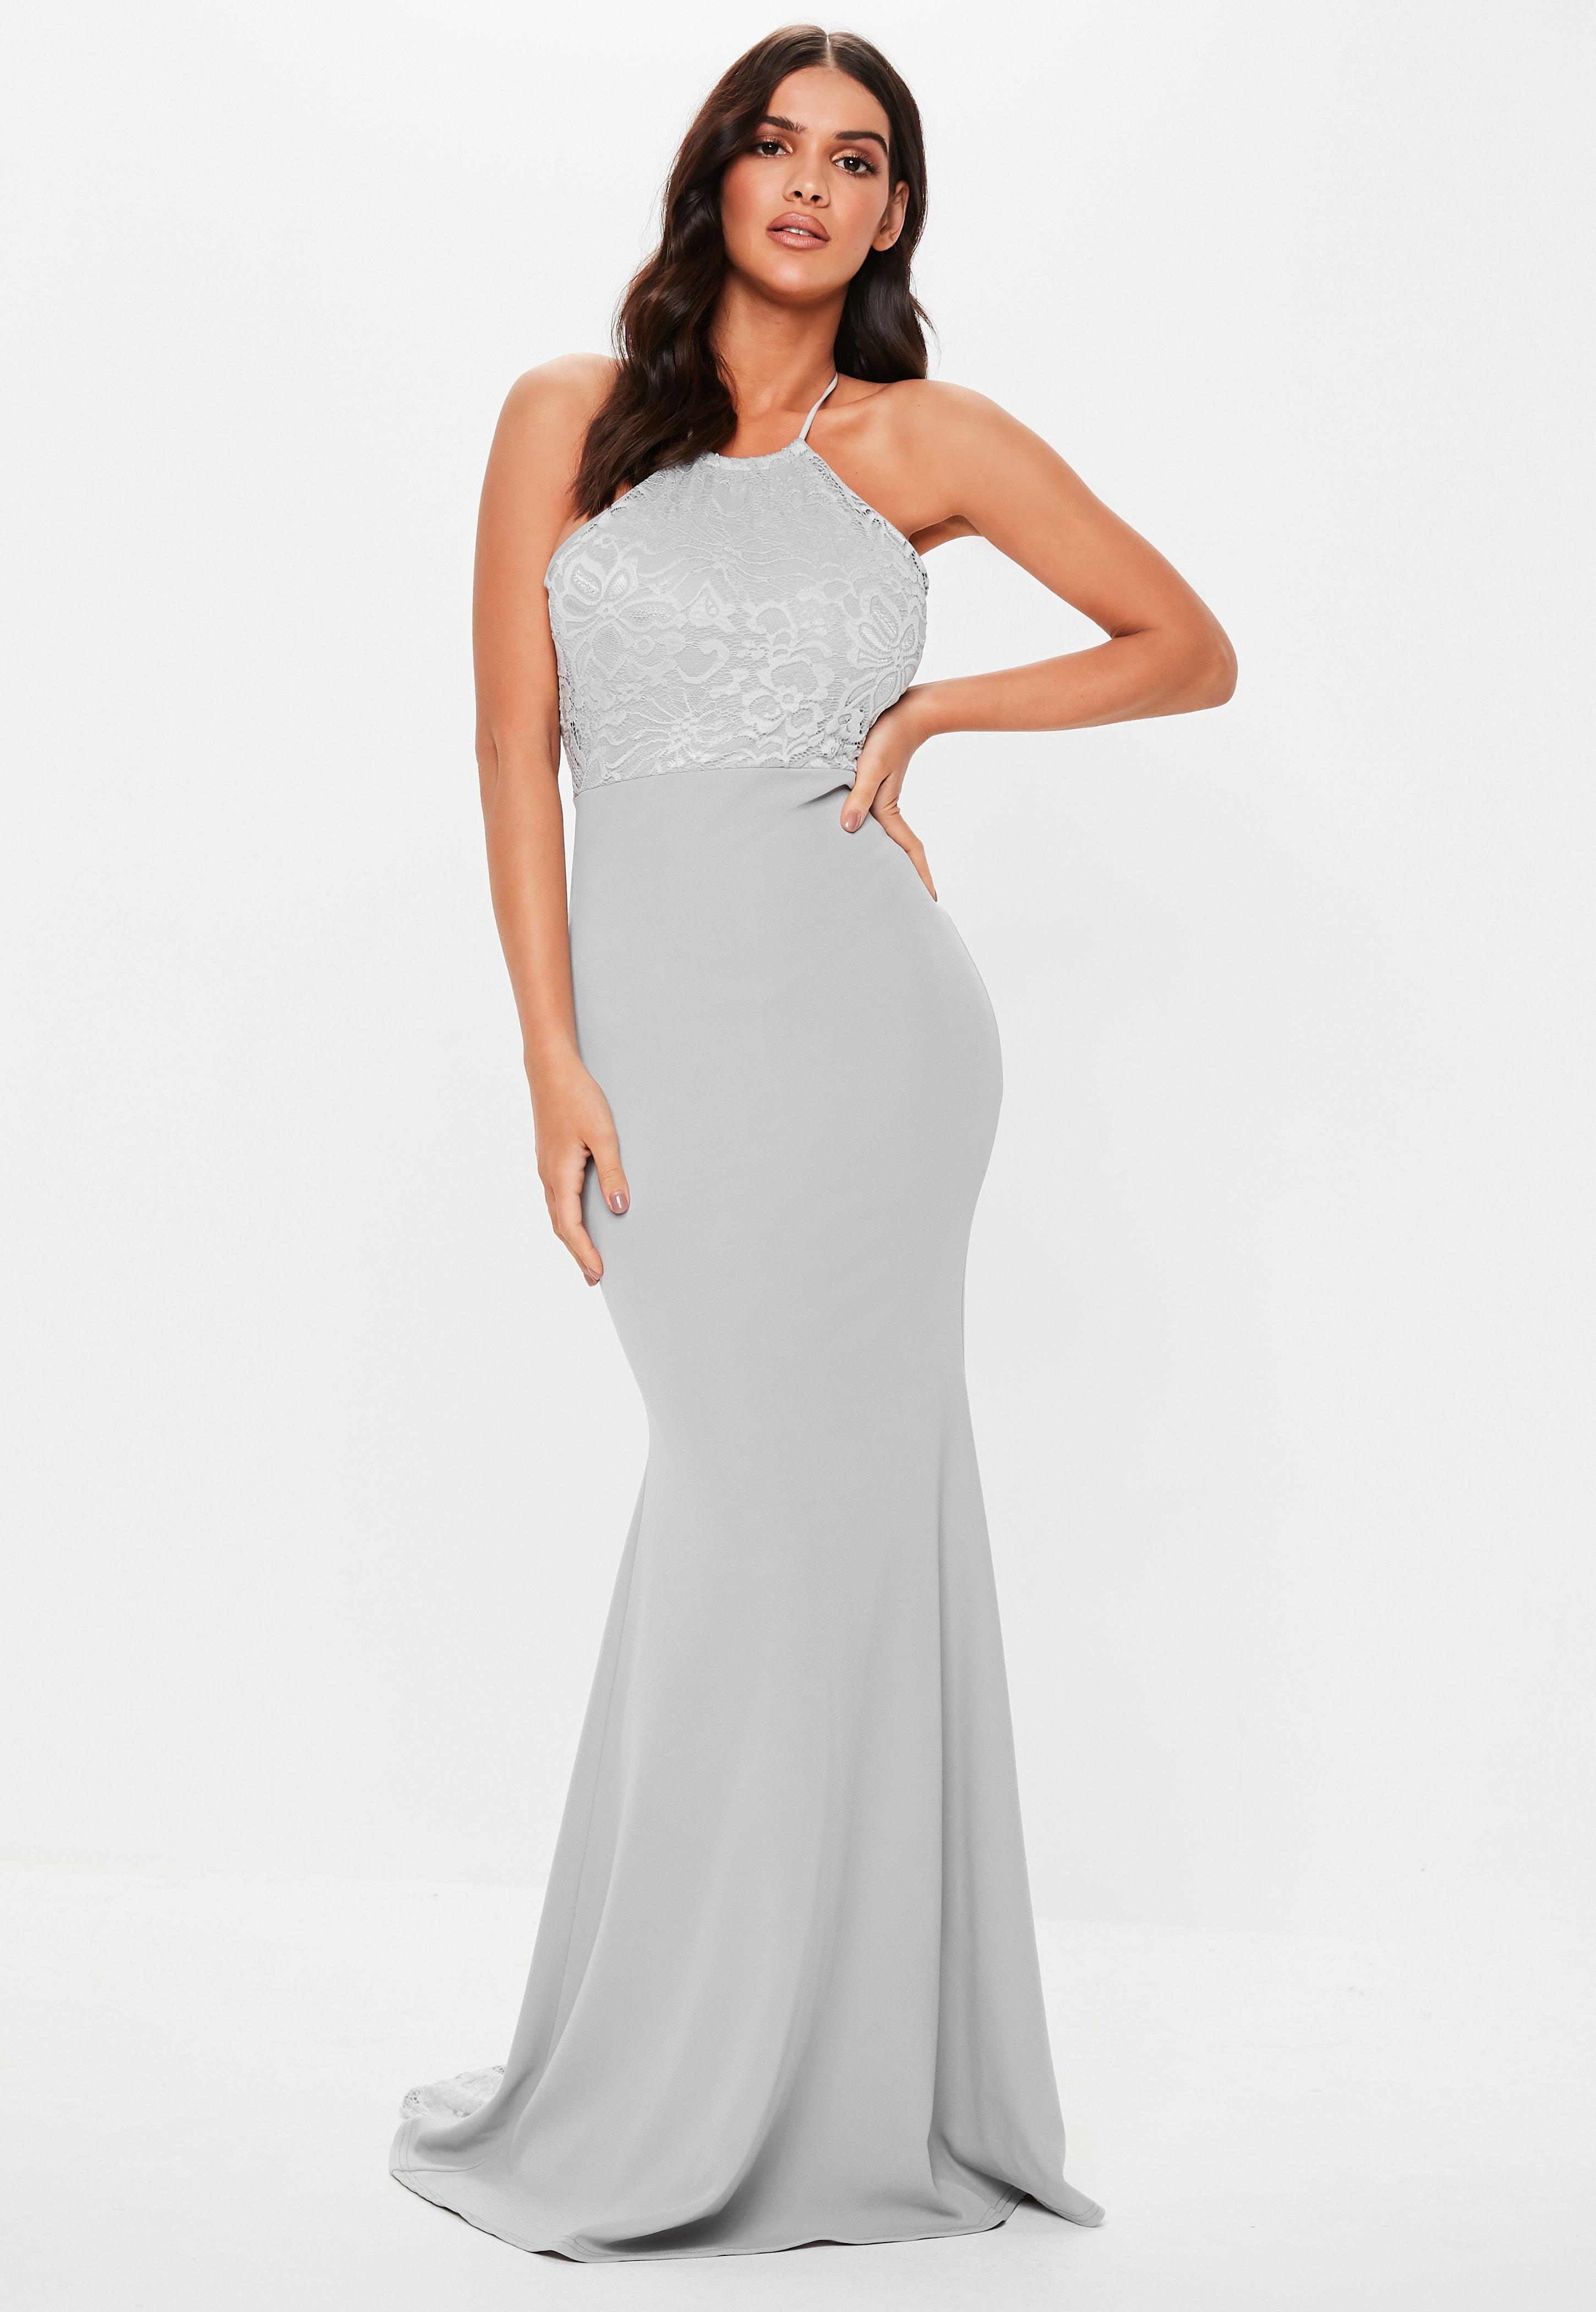 6a39f7e02969 Lace Dresses